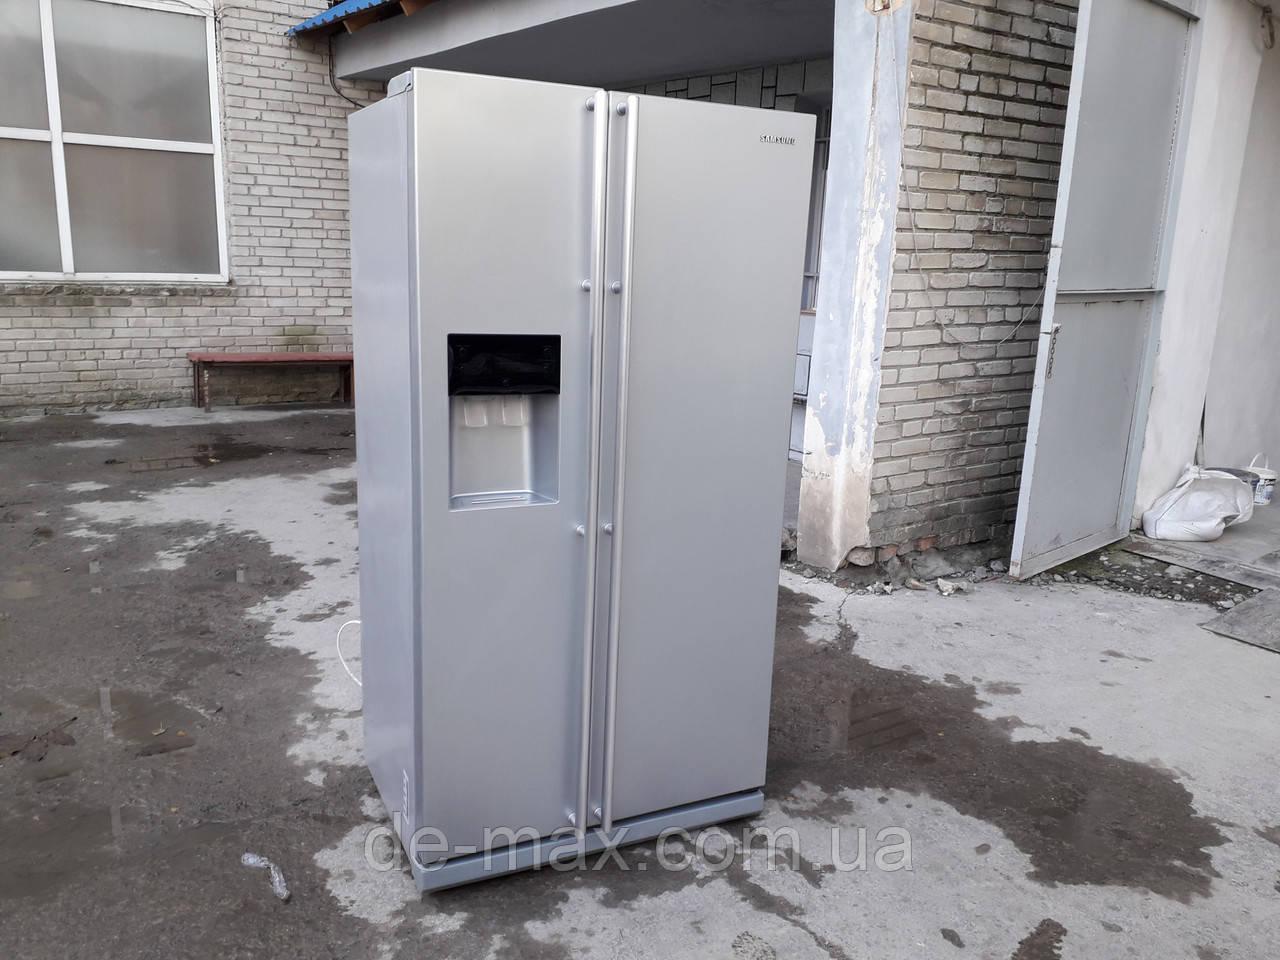 Side-by-side холодильник Samsung RSG-5FURS1 No Frost